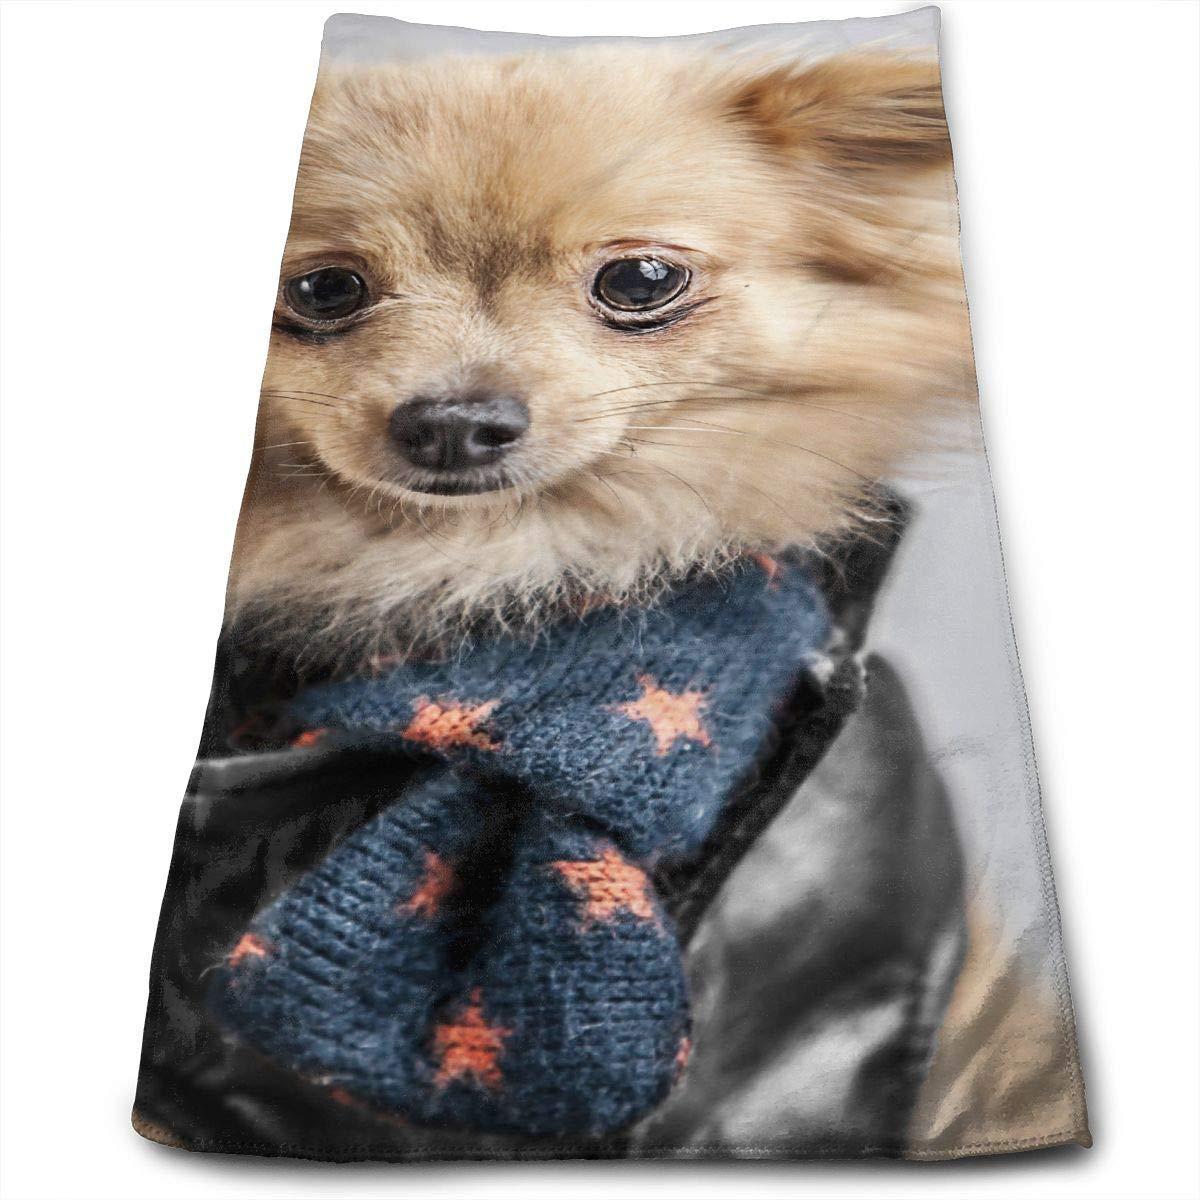 Osmykqe The Pet Pomeranian Cotton Bath Towels for Hotel-SPA-Pool-Gym-Bathroom Super Soft Absorbent Ringspun Towels